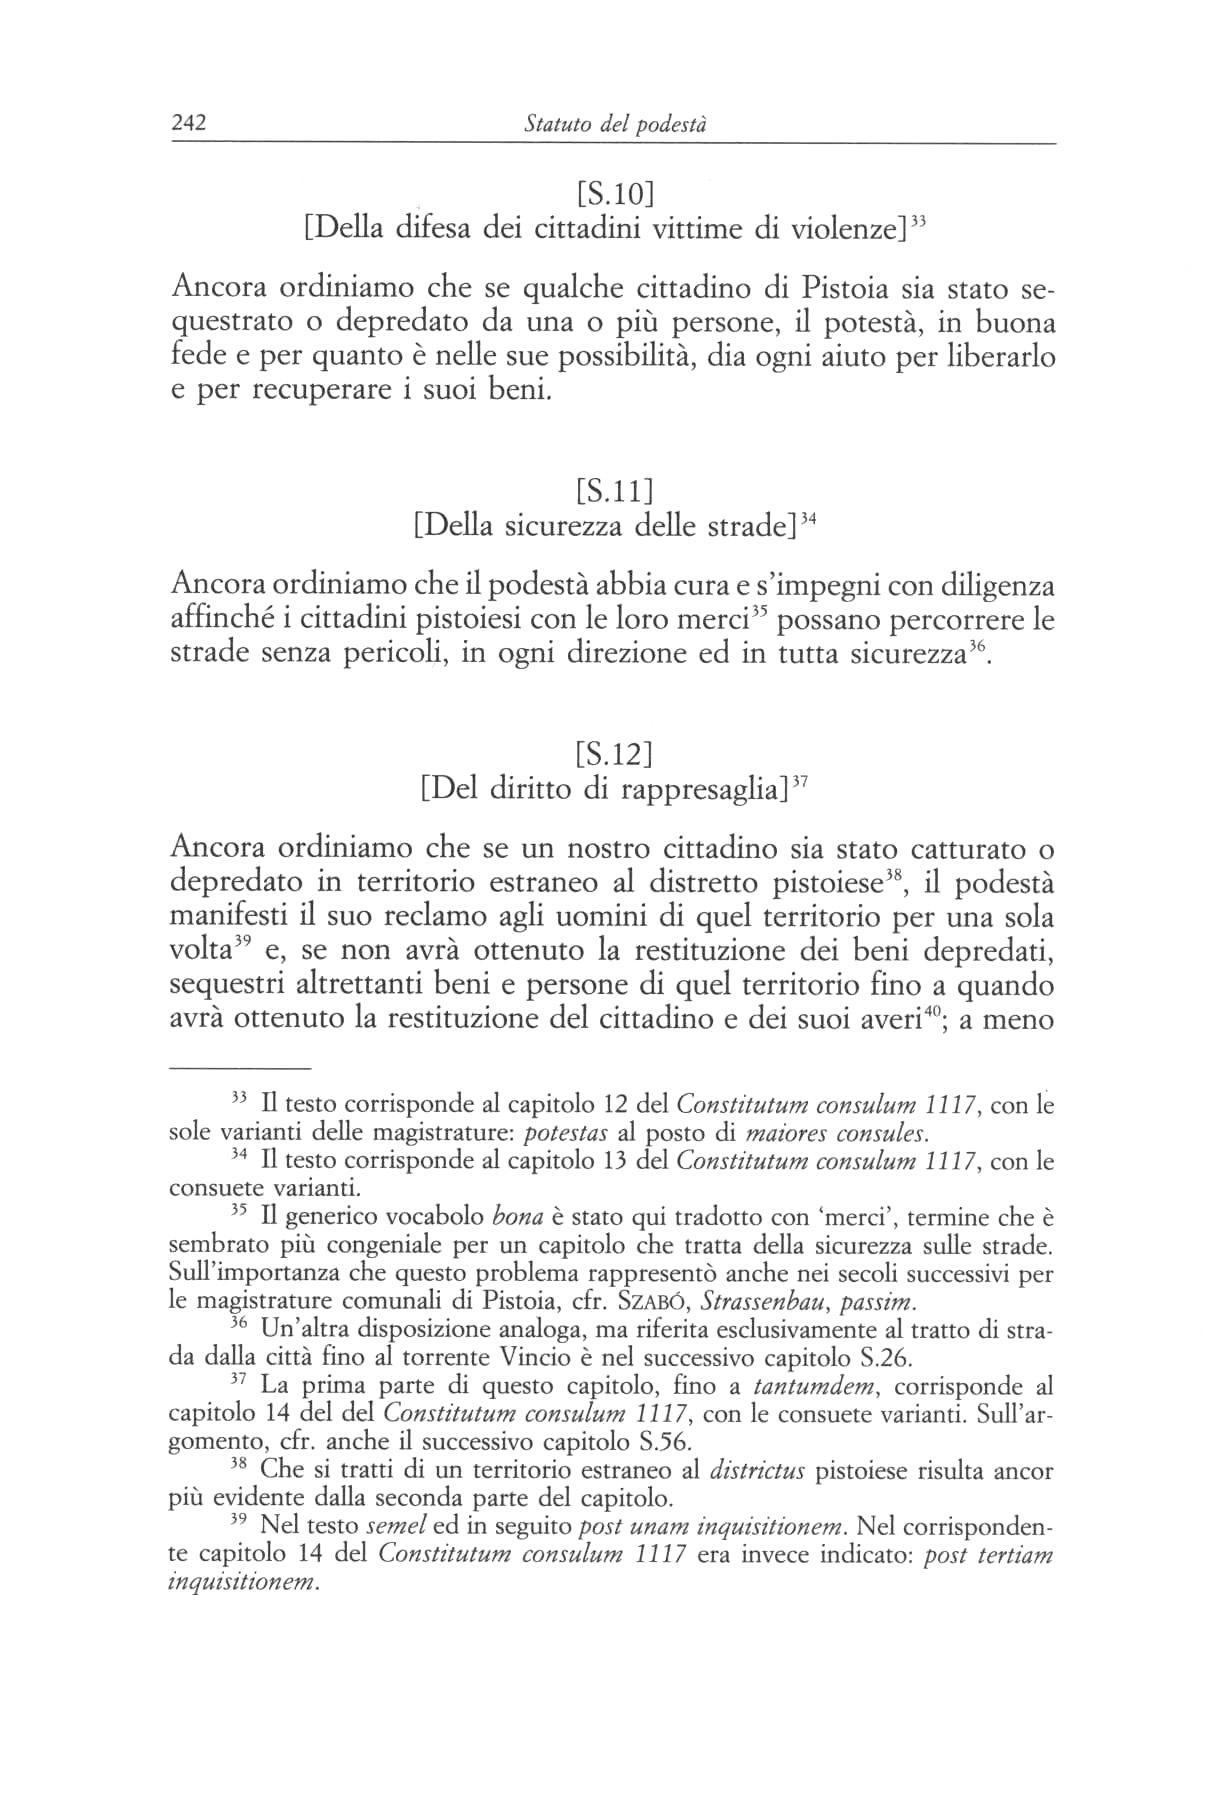 statuti pistoiesi del sec.XII 0242.jpg